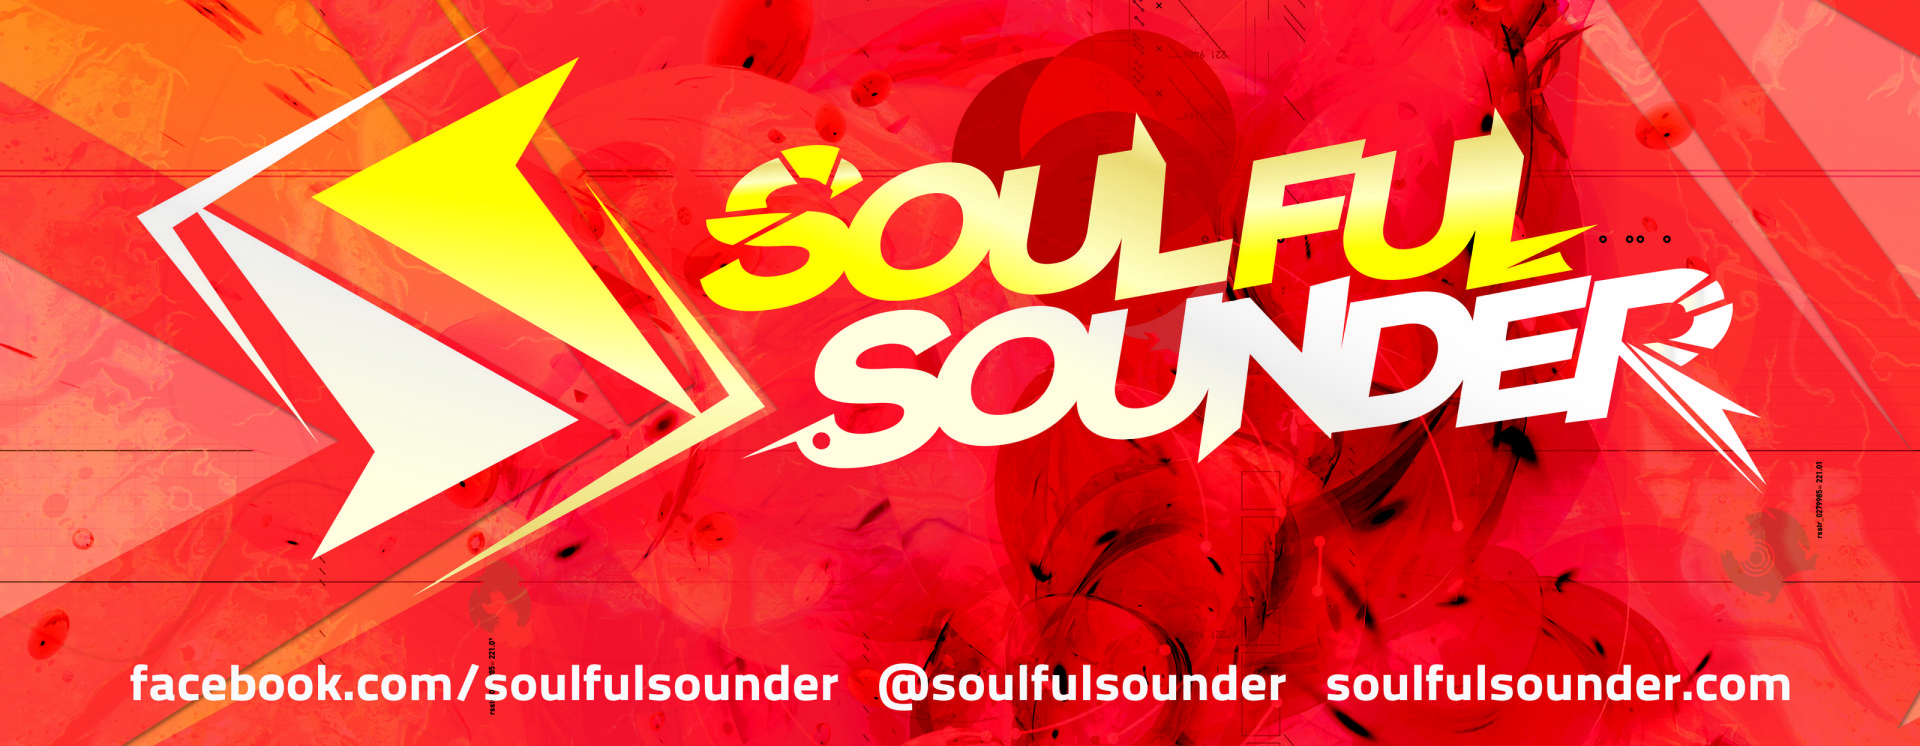 Soulful 6x3 banner copy